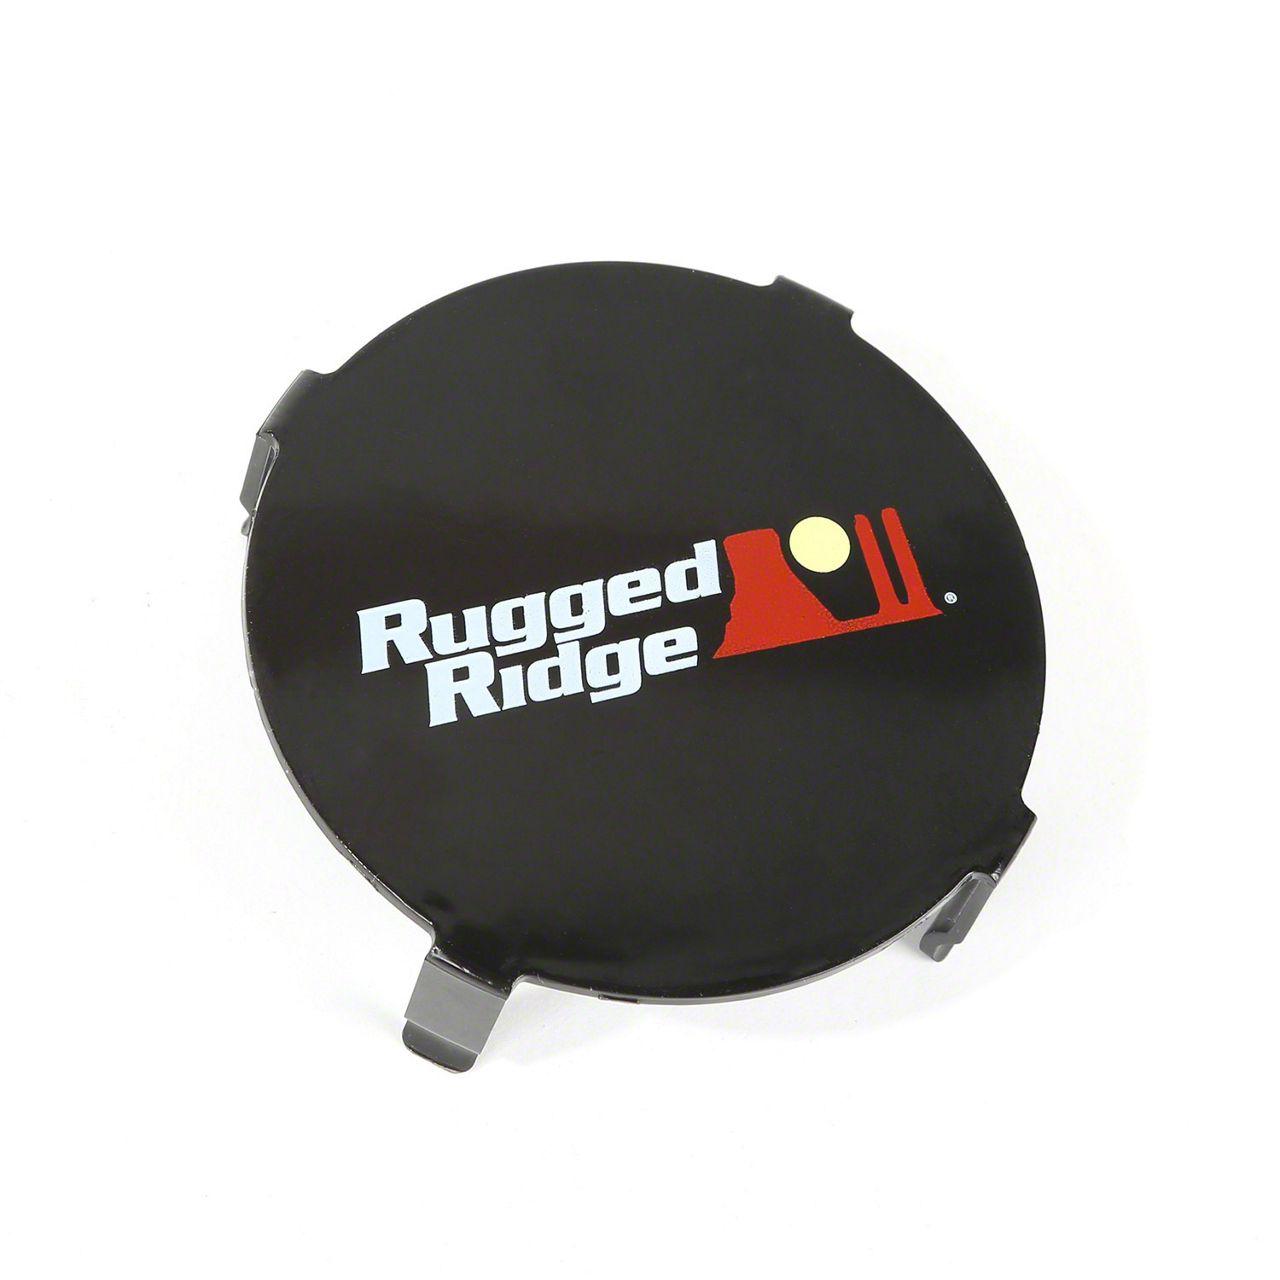 Rugged Ridge 3.5 in. LED Light Cover - Black